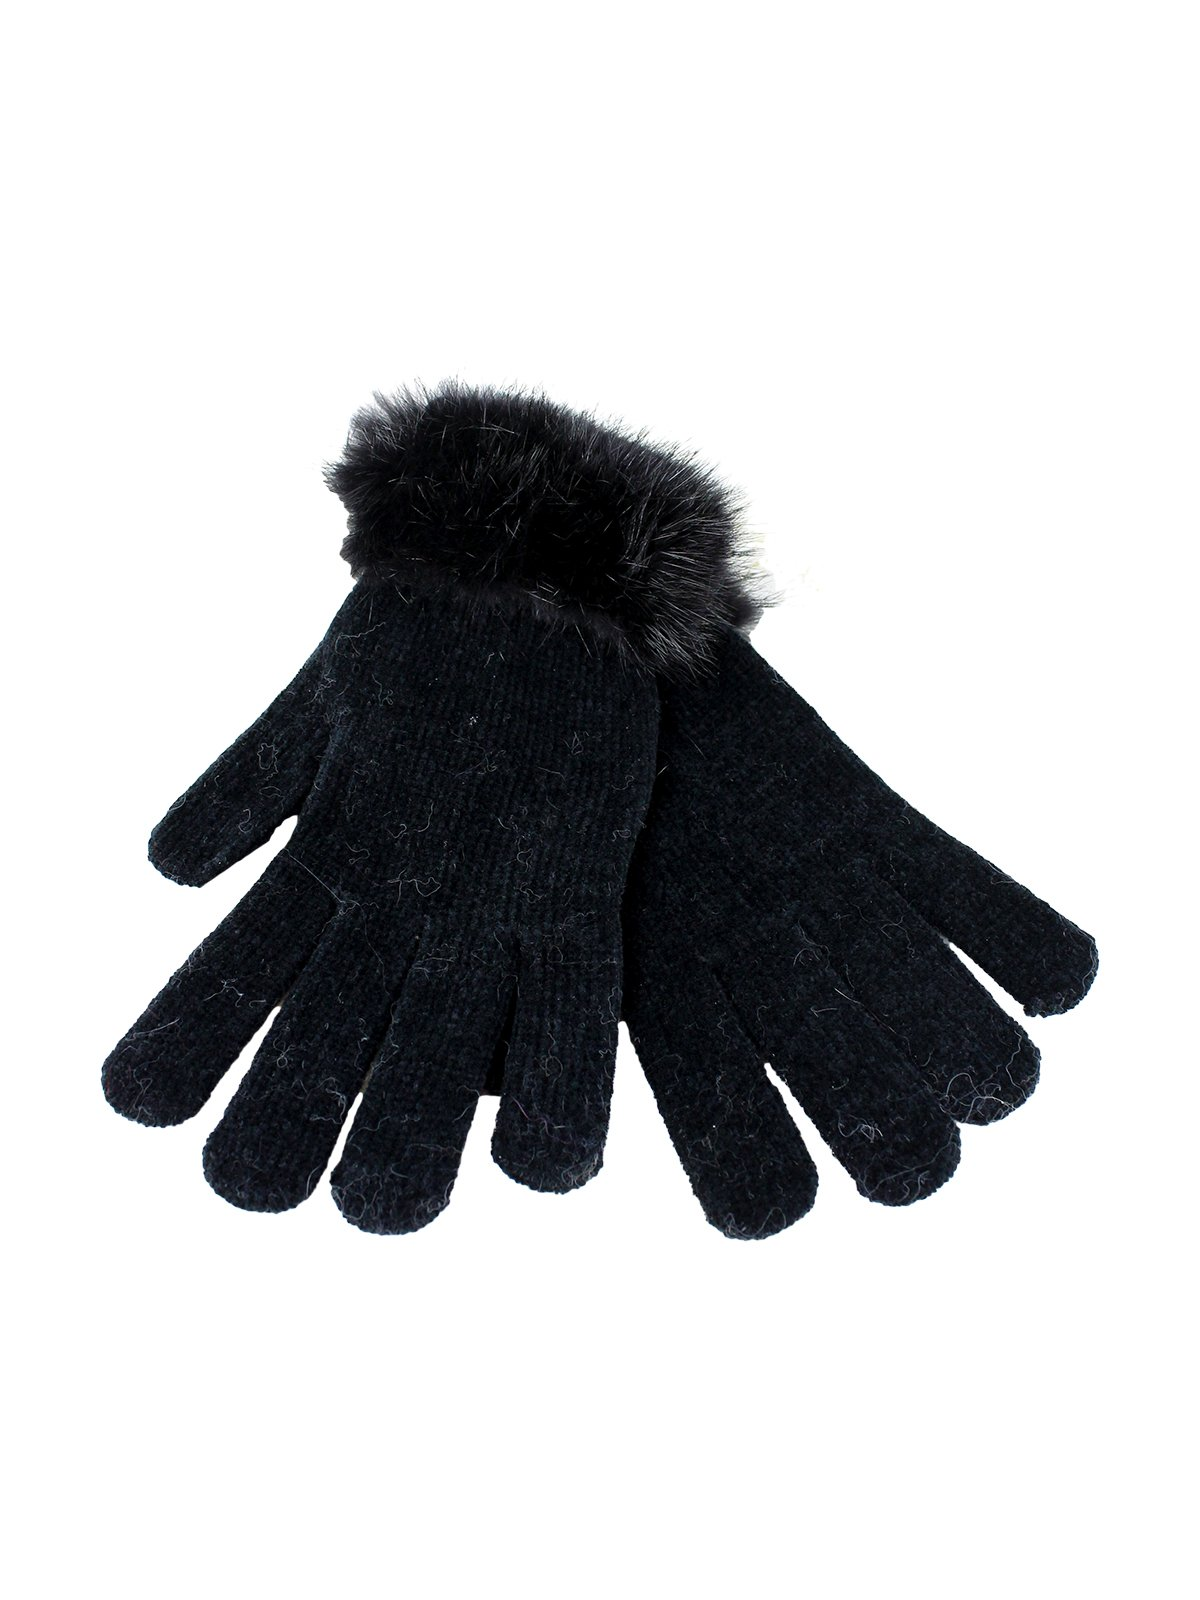 Woman's Black Knit Chenille Gloves